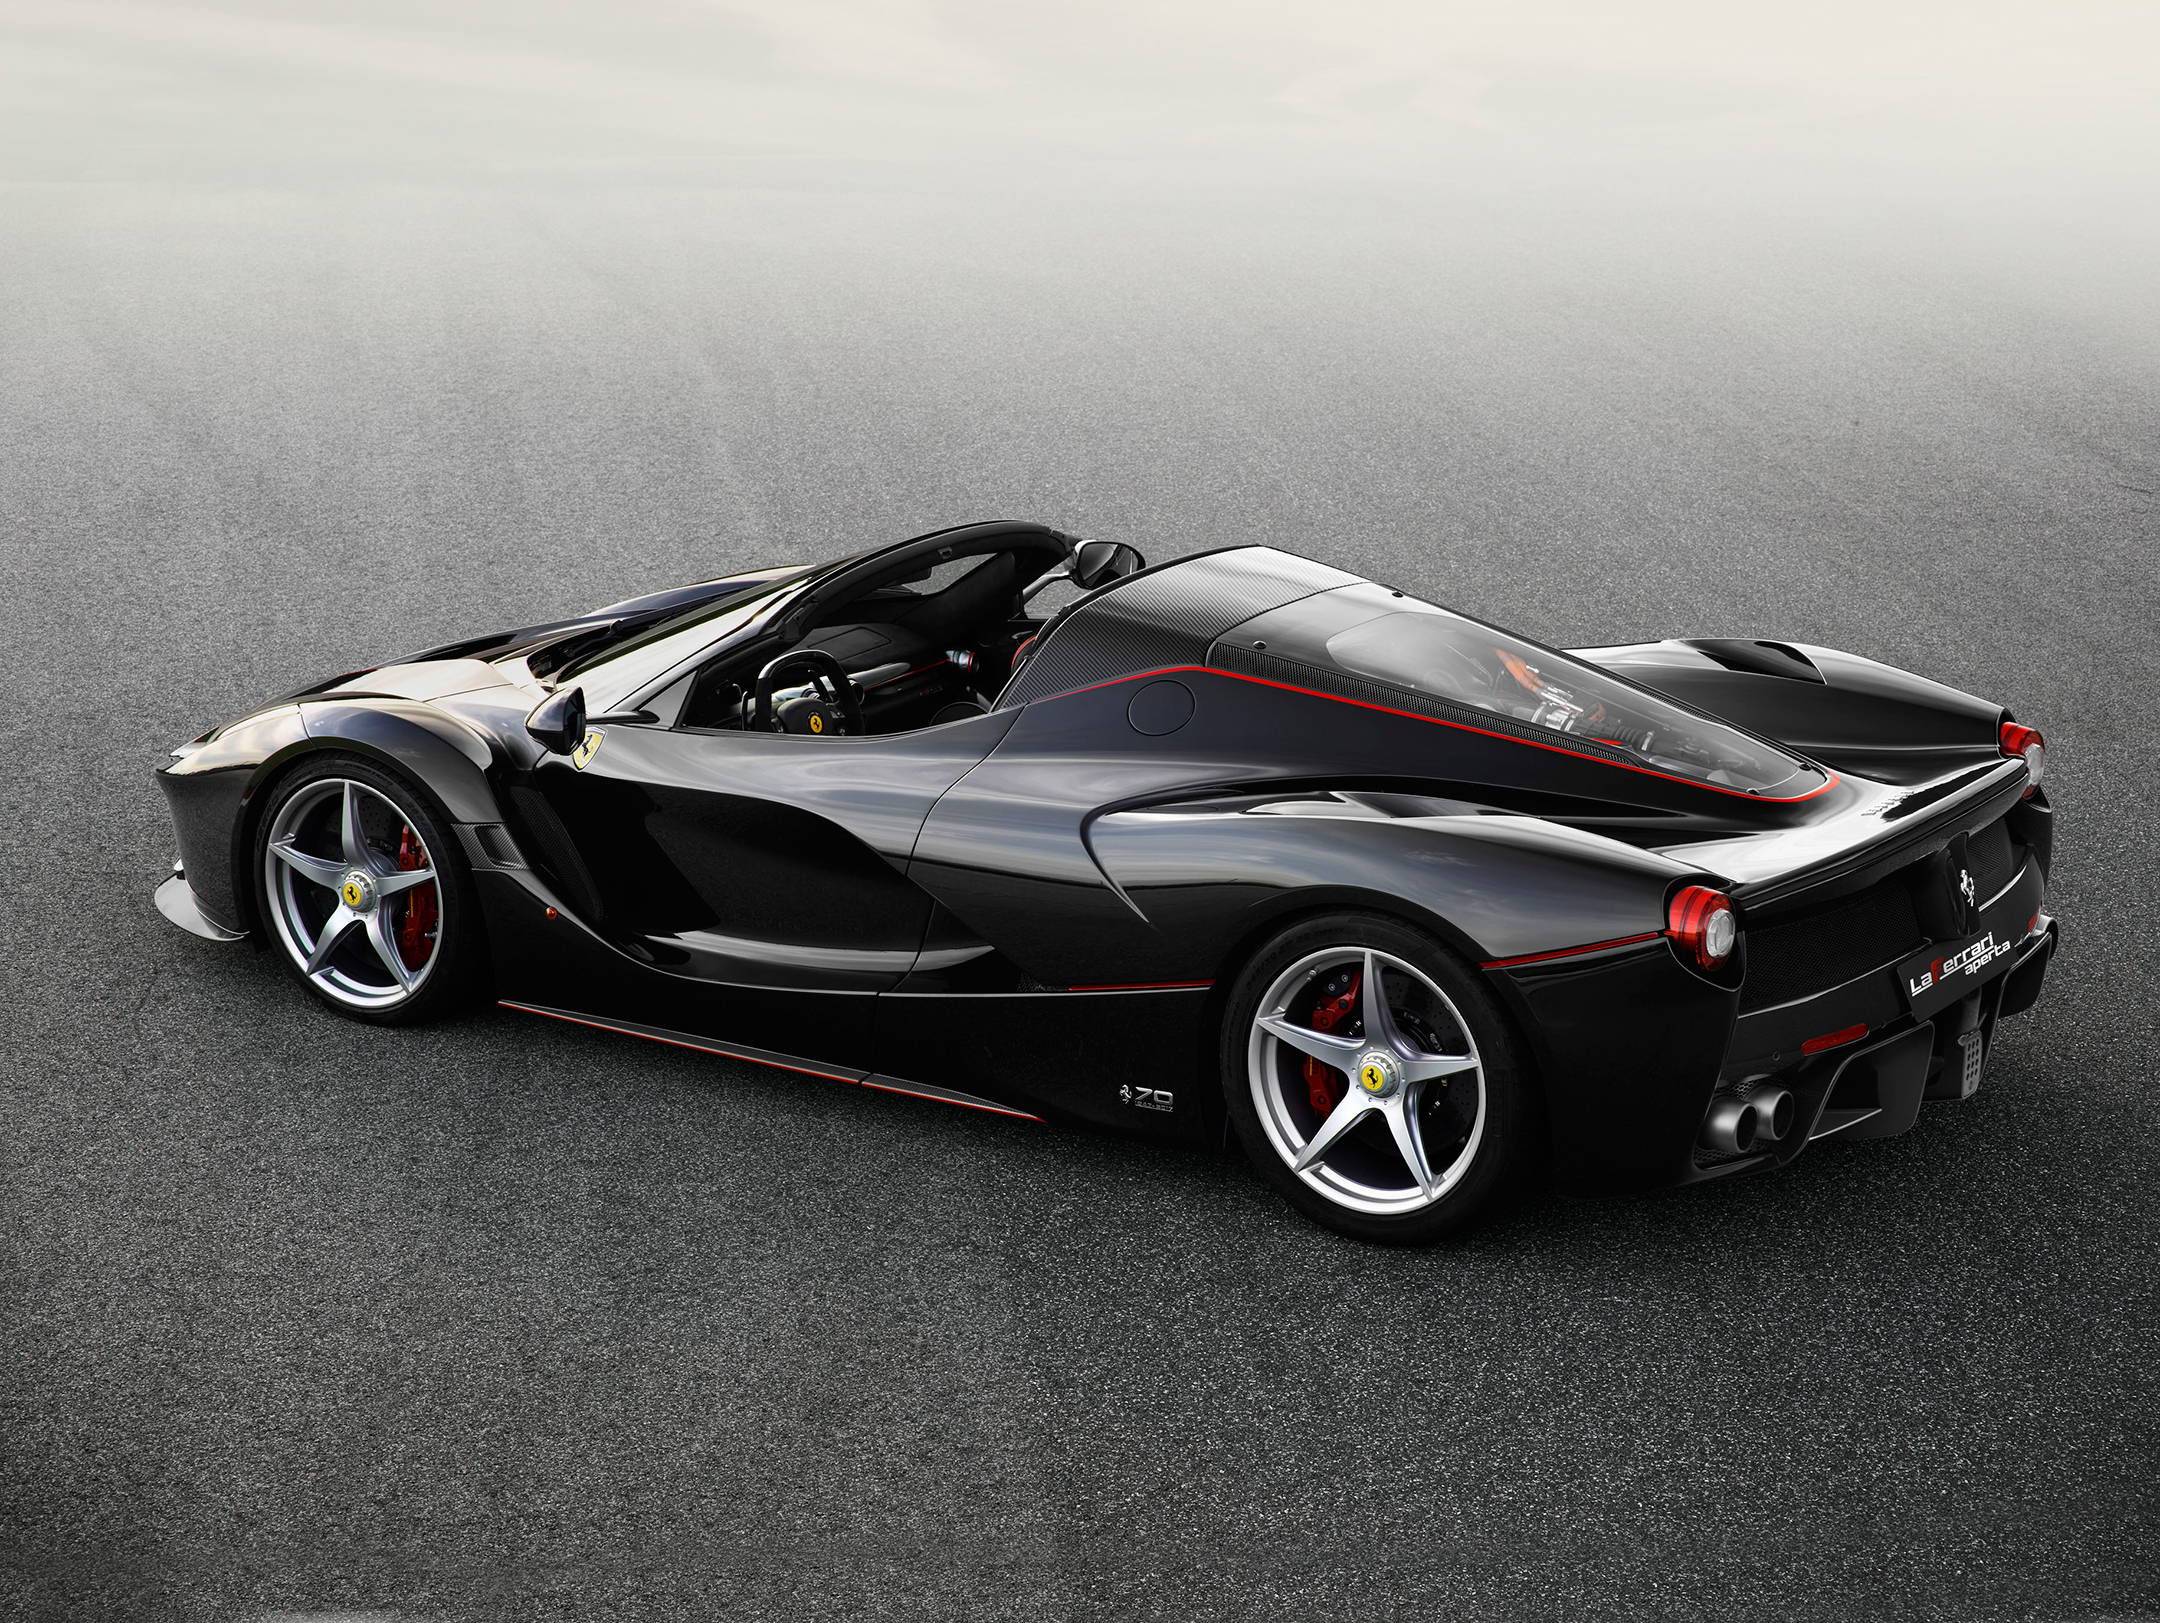 LaFerrari Aperta - 2016 - rear / arrière